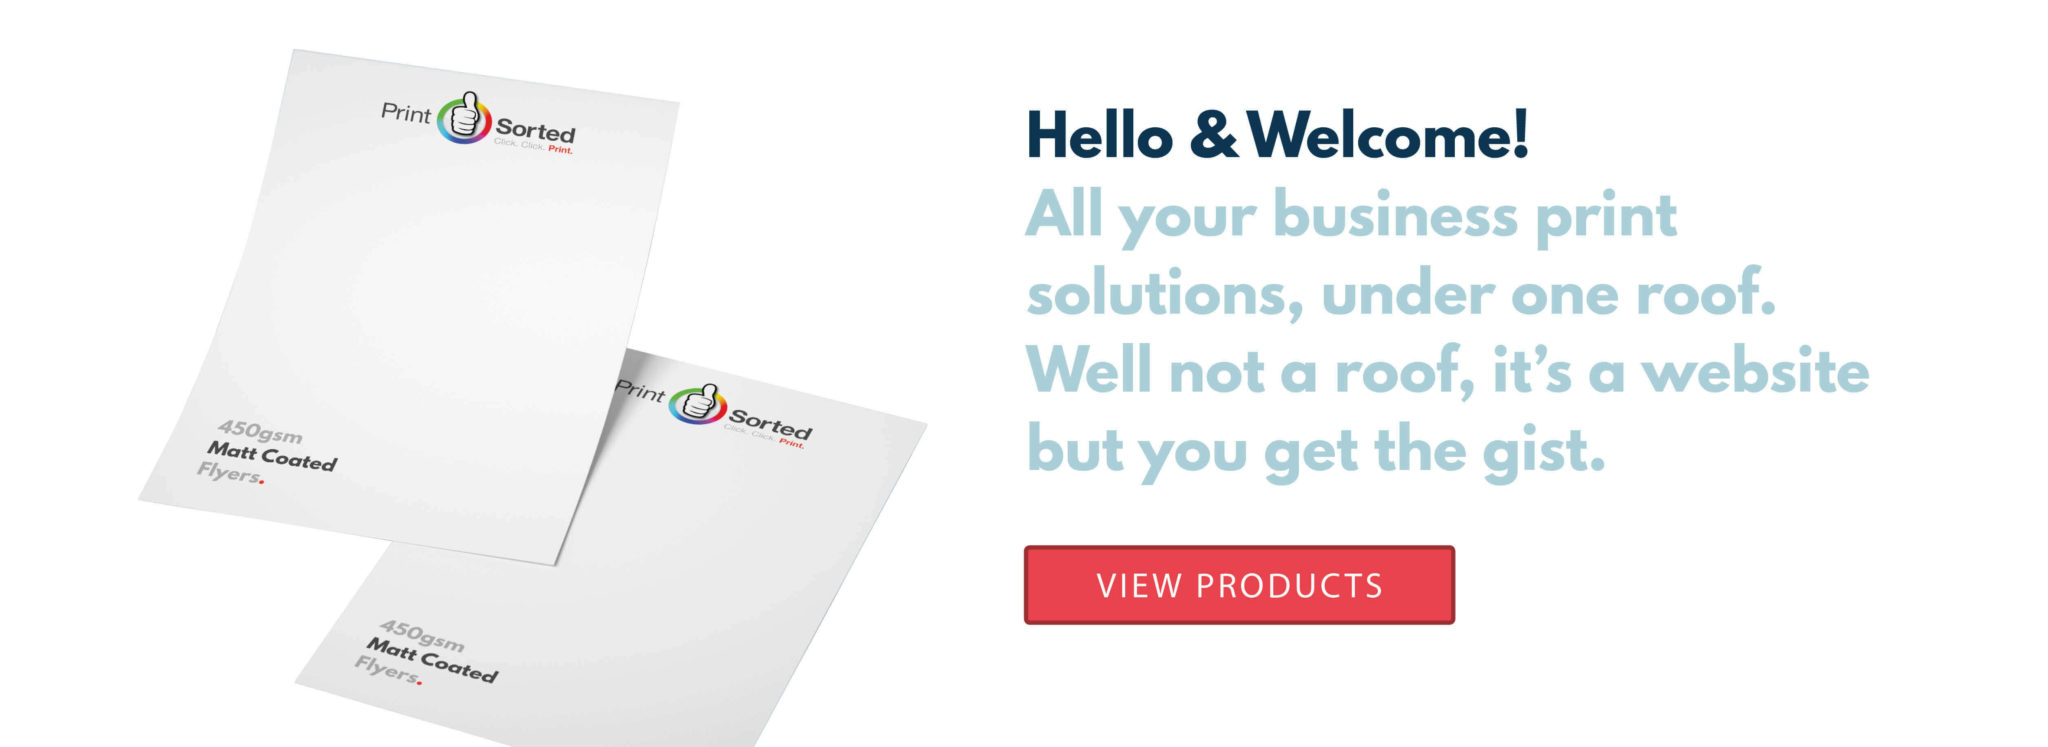 Hello & Welcome to Printsorted slide